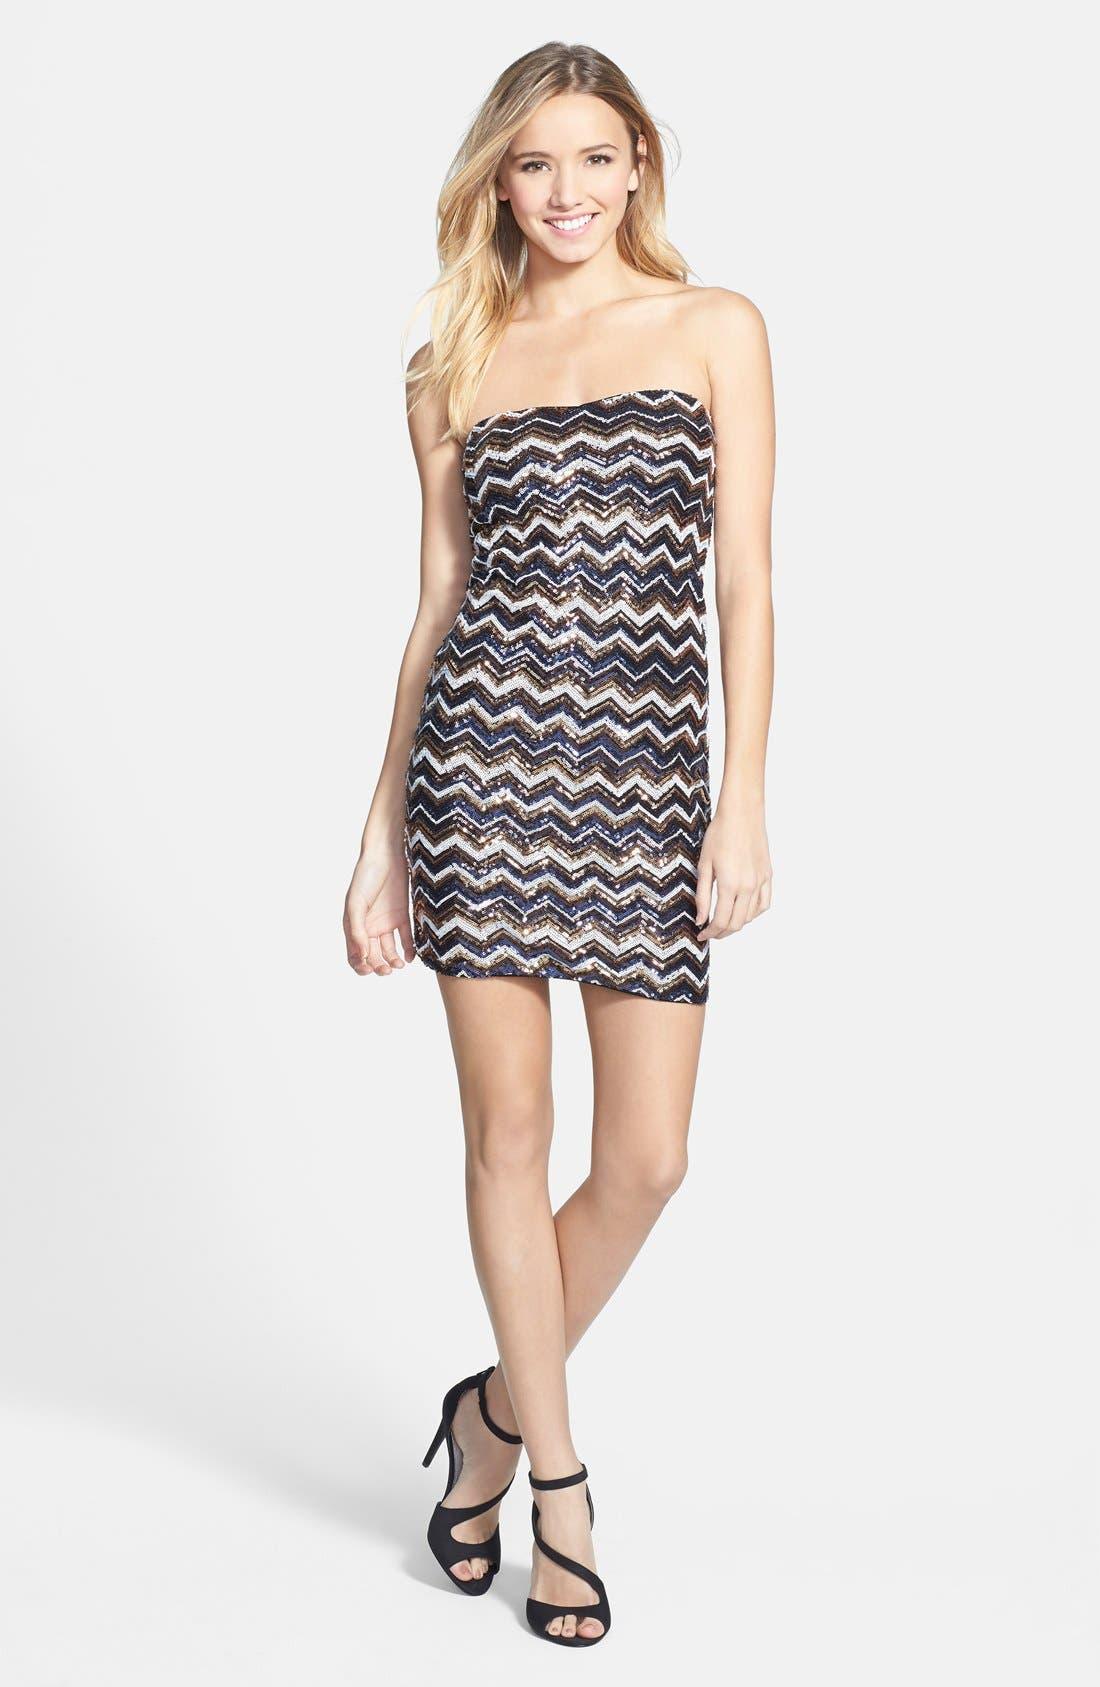 Alternate Image 1 Selected - As U Wish Sequin Chevron Strapless Body-Con Dress